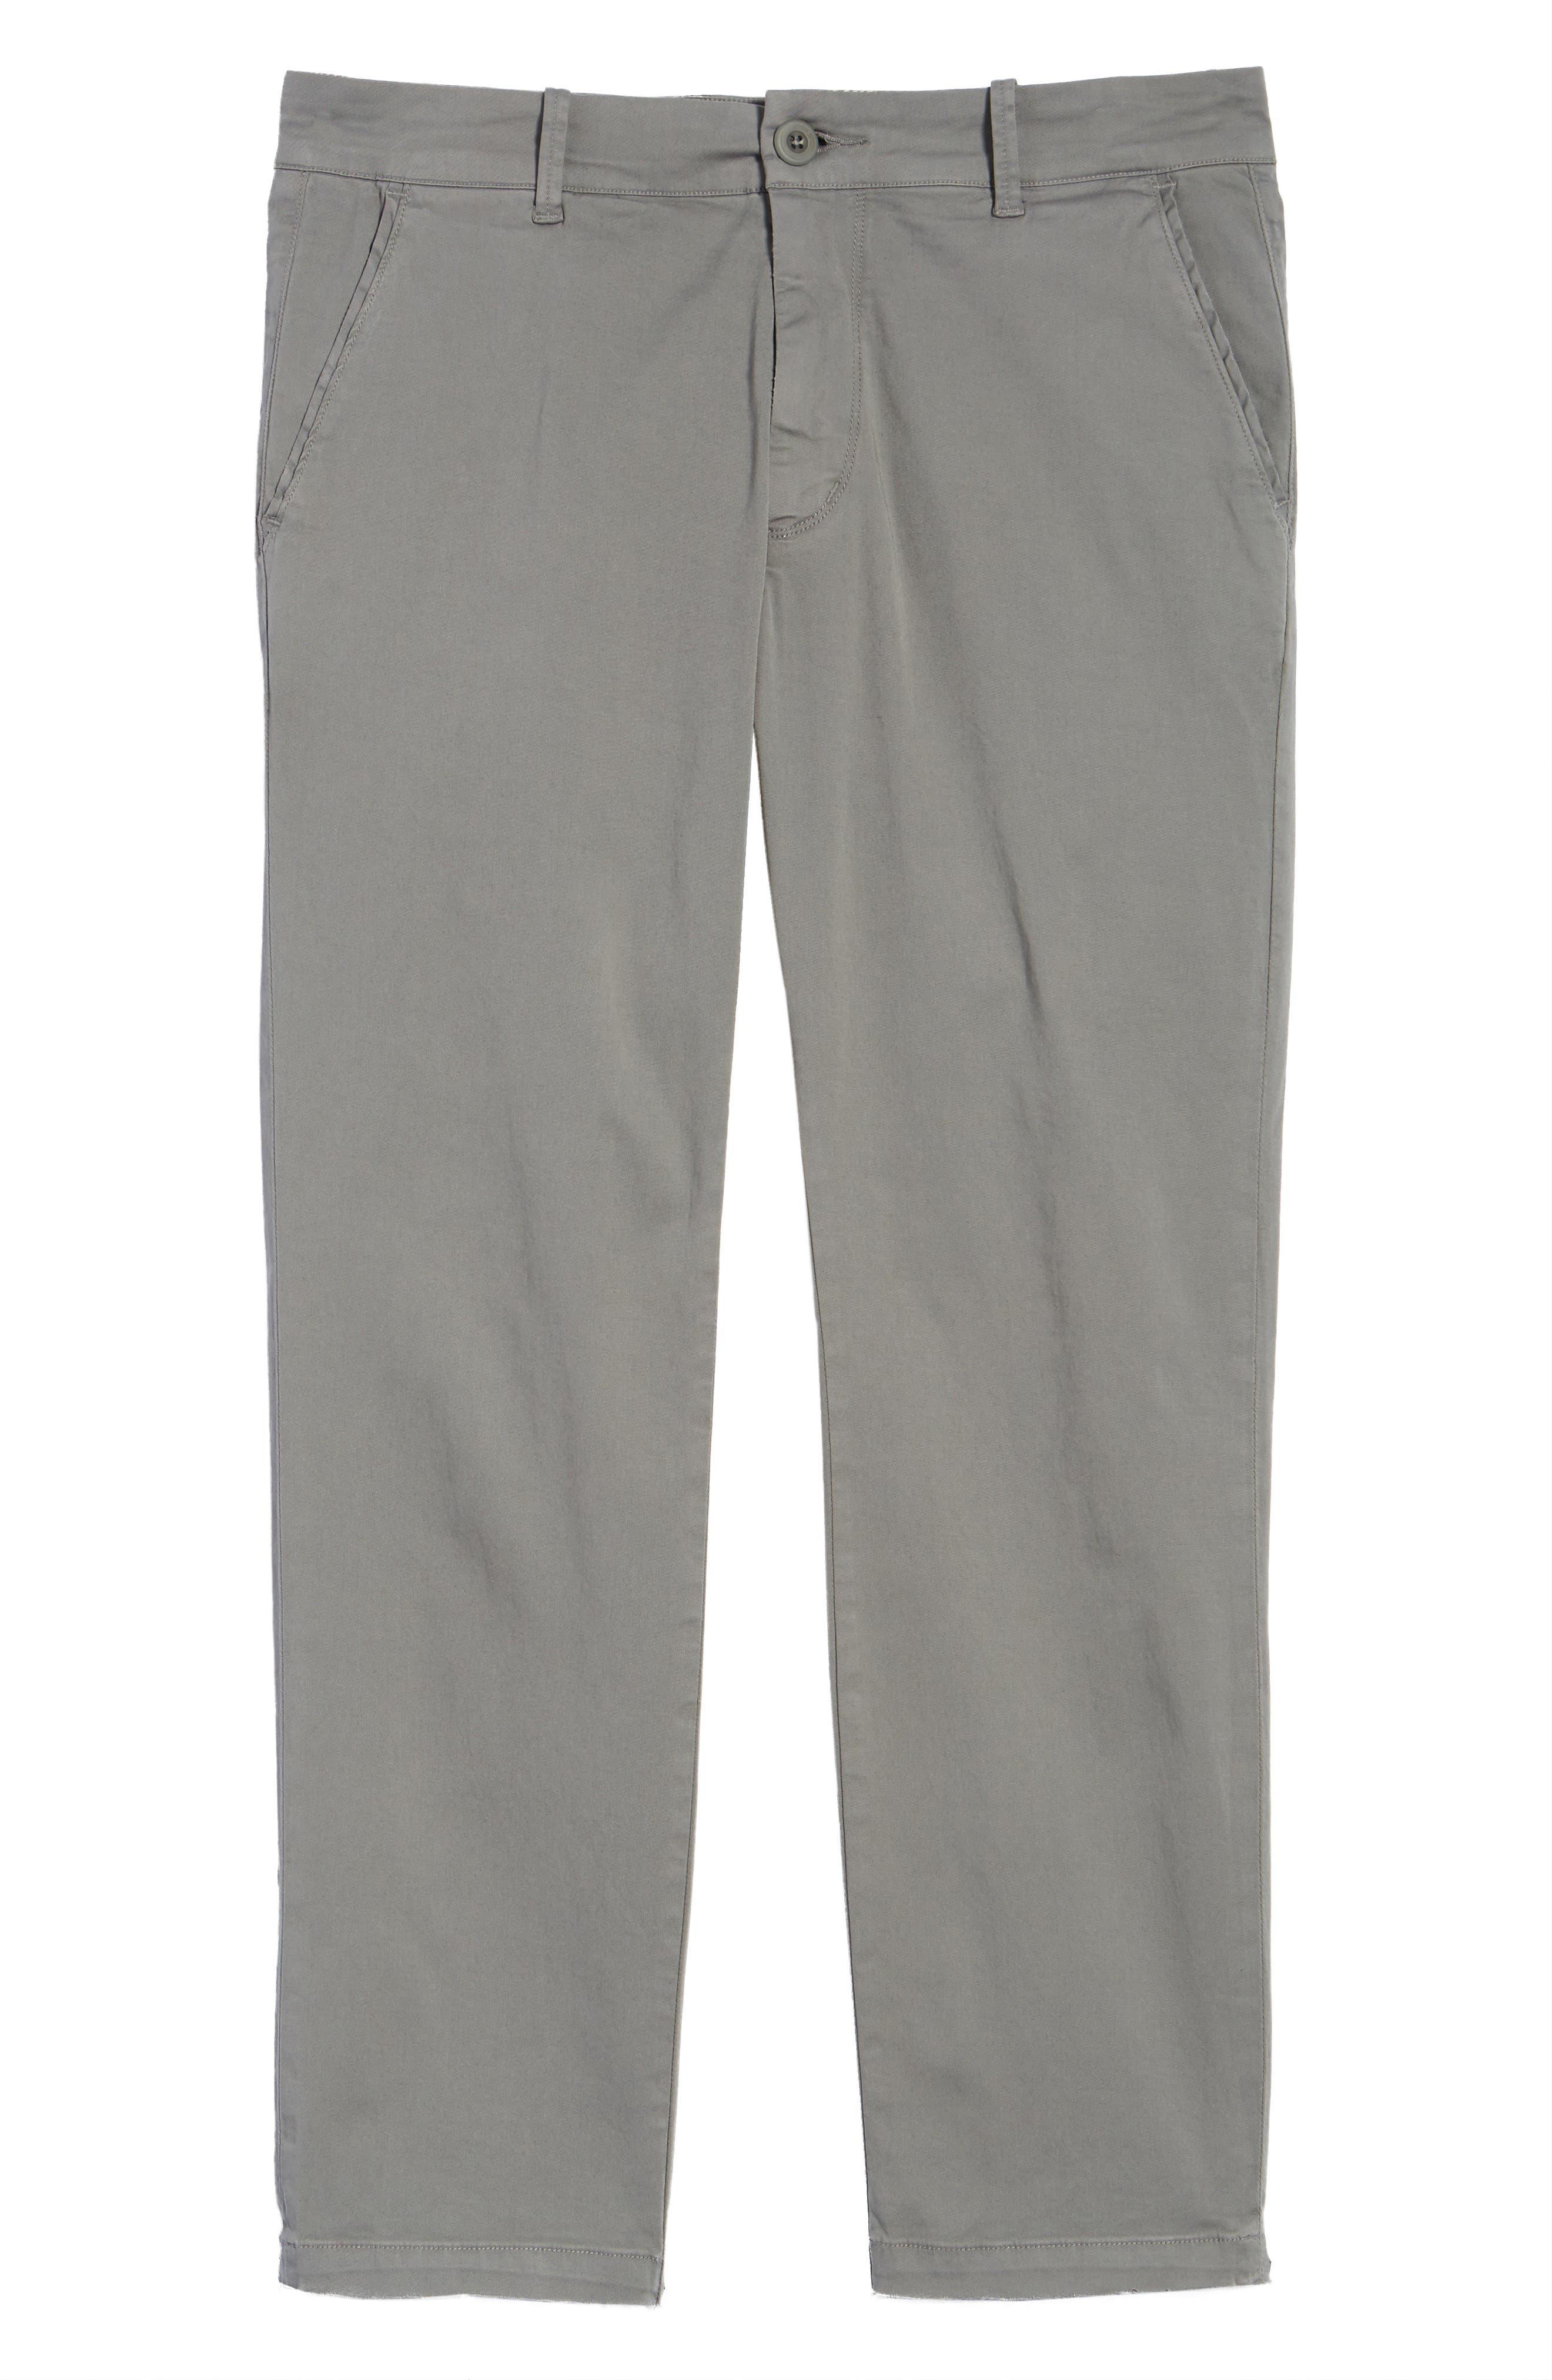 Hudson Clint Stretch Chino Pants,                             Alternate thumbnail 6, color,                             Grey